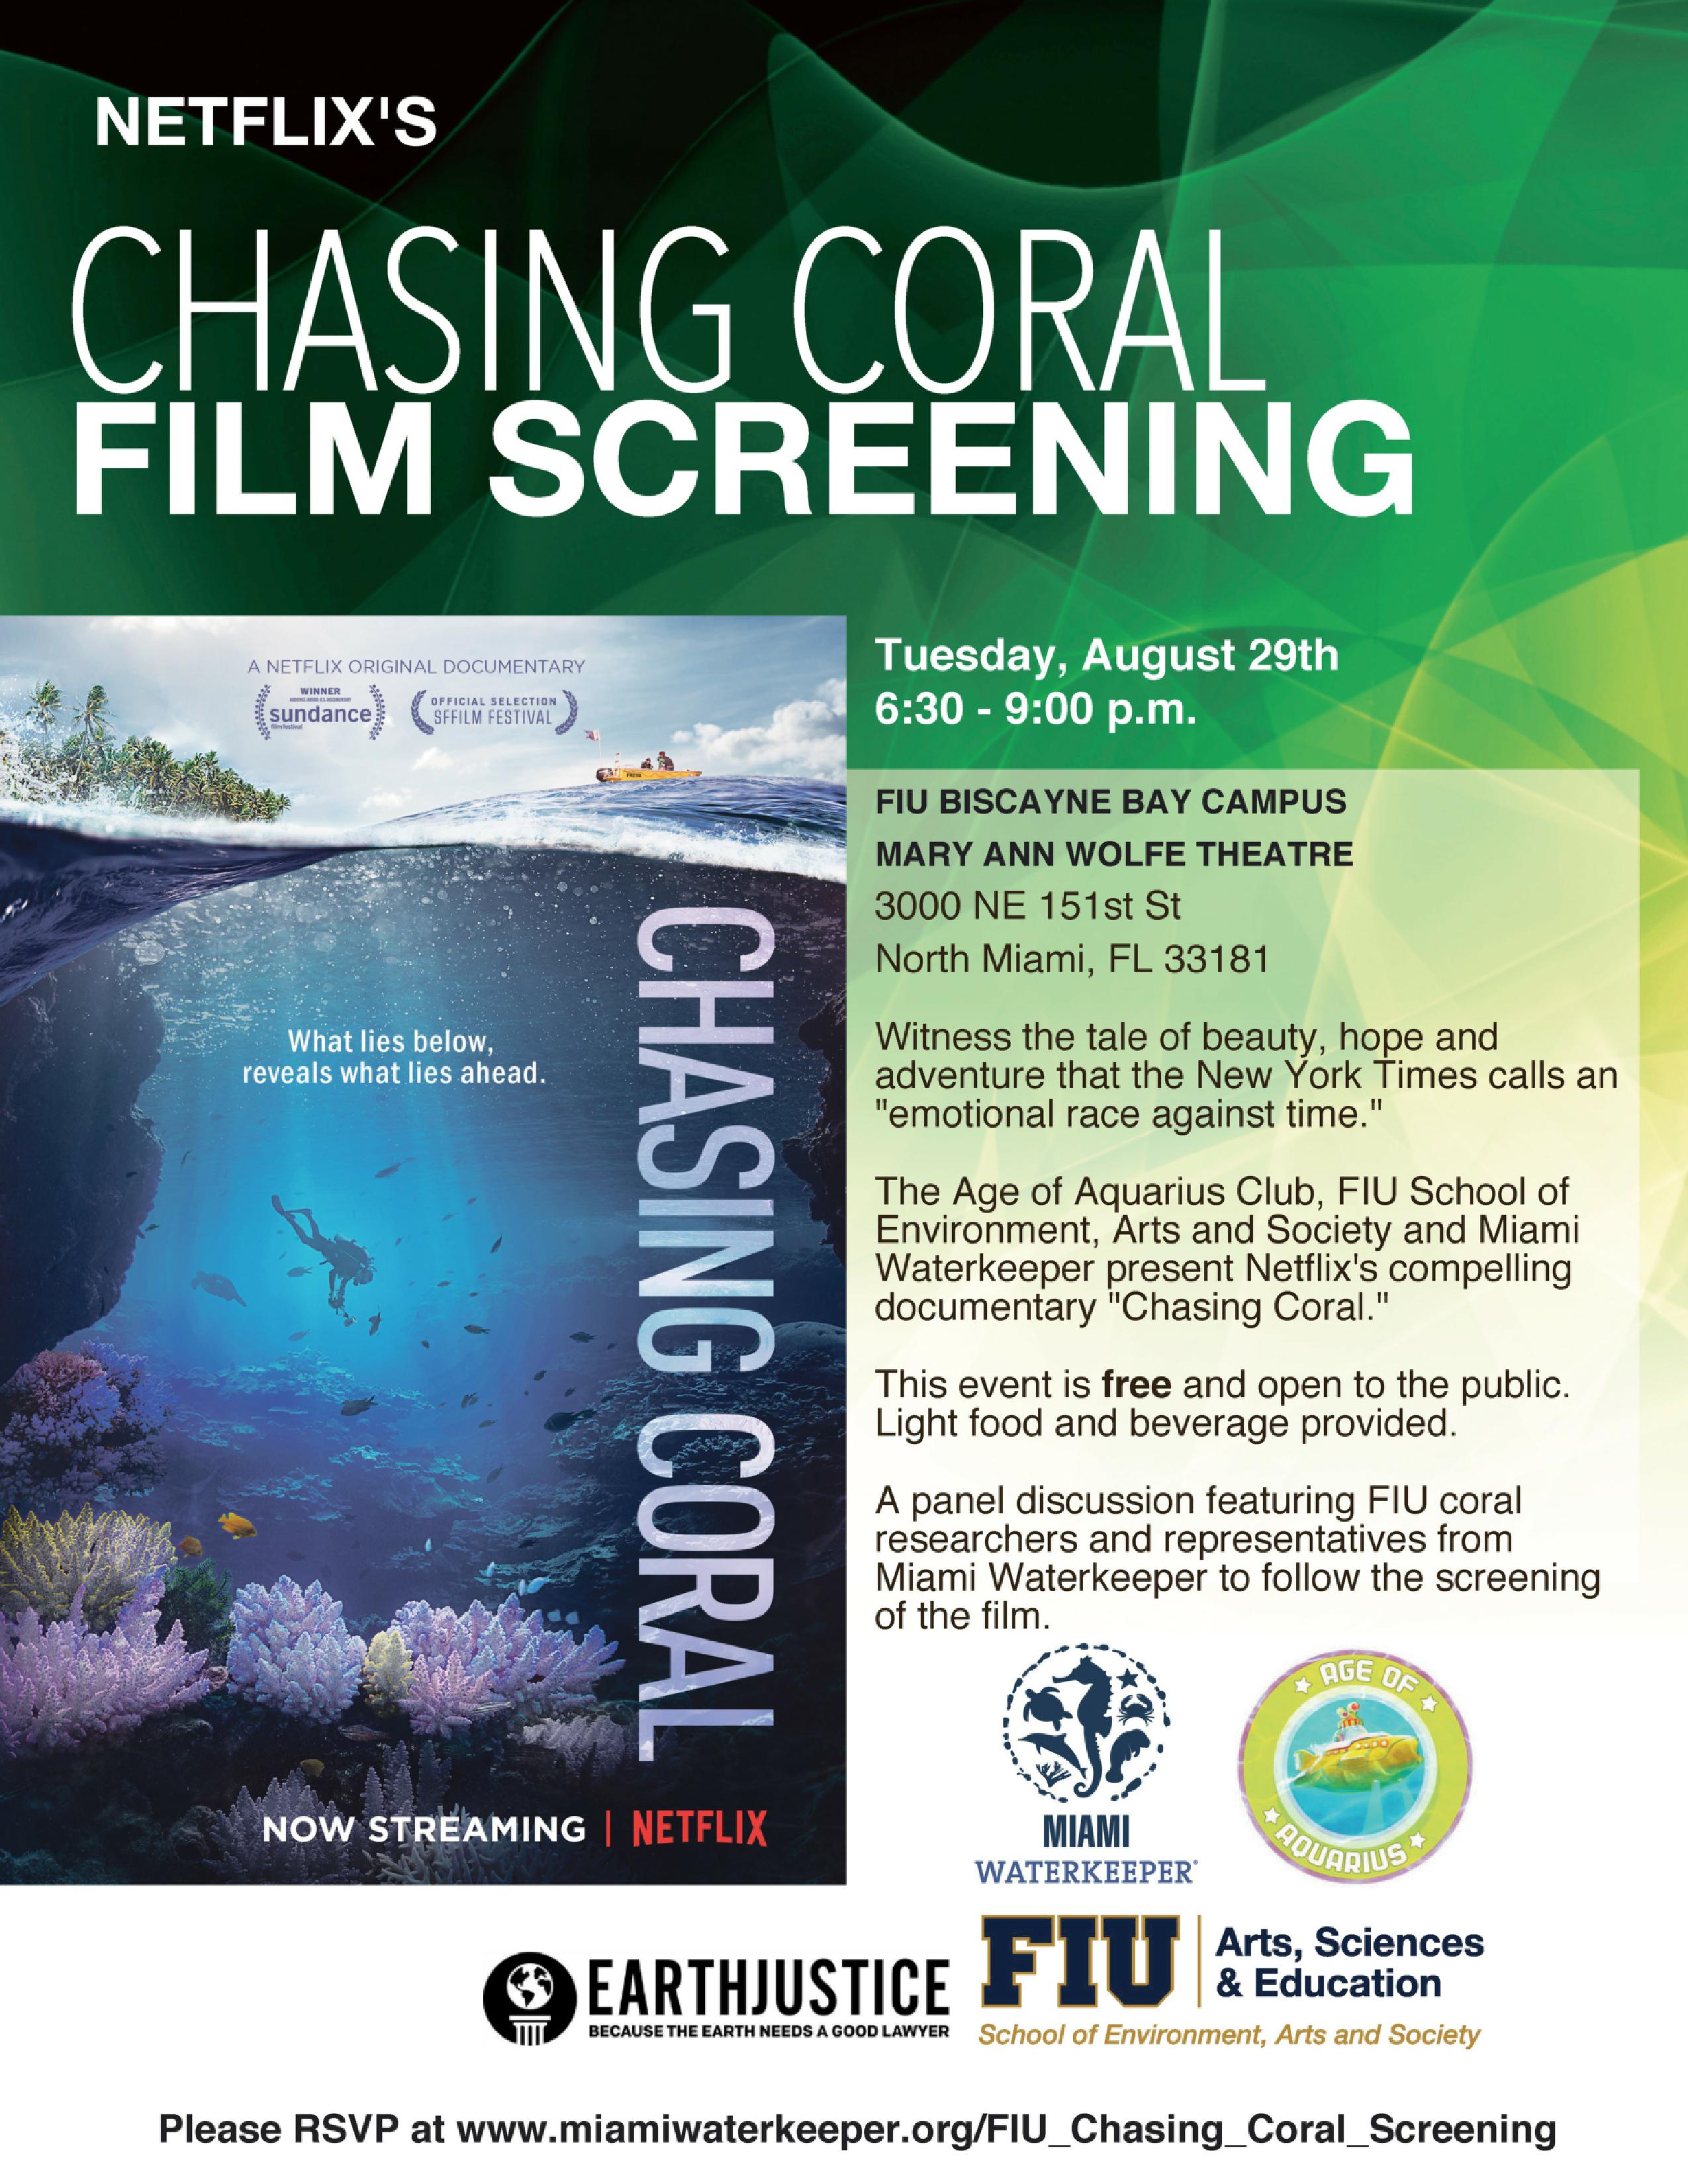 FIU_Chasing_Coral.png